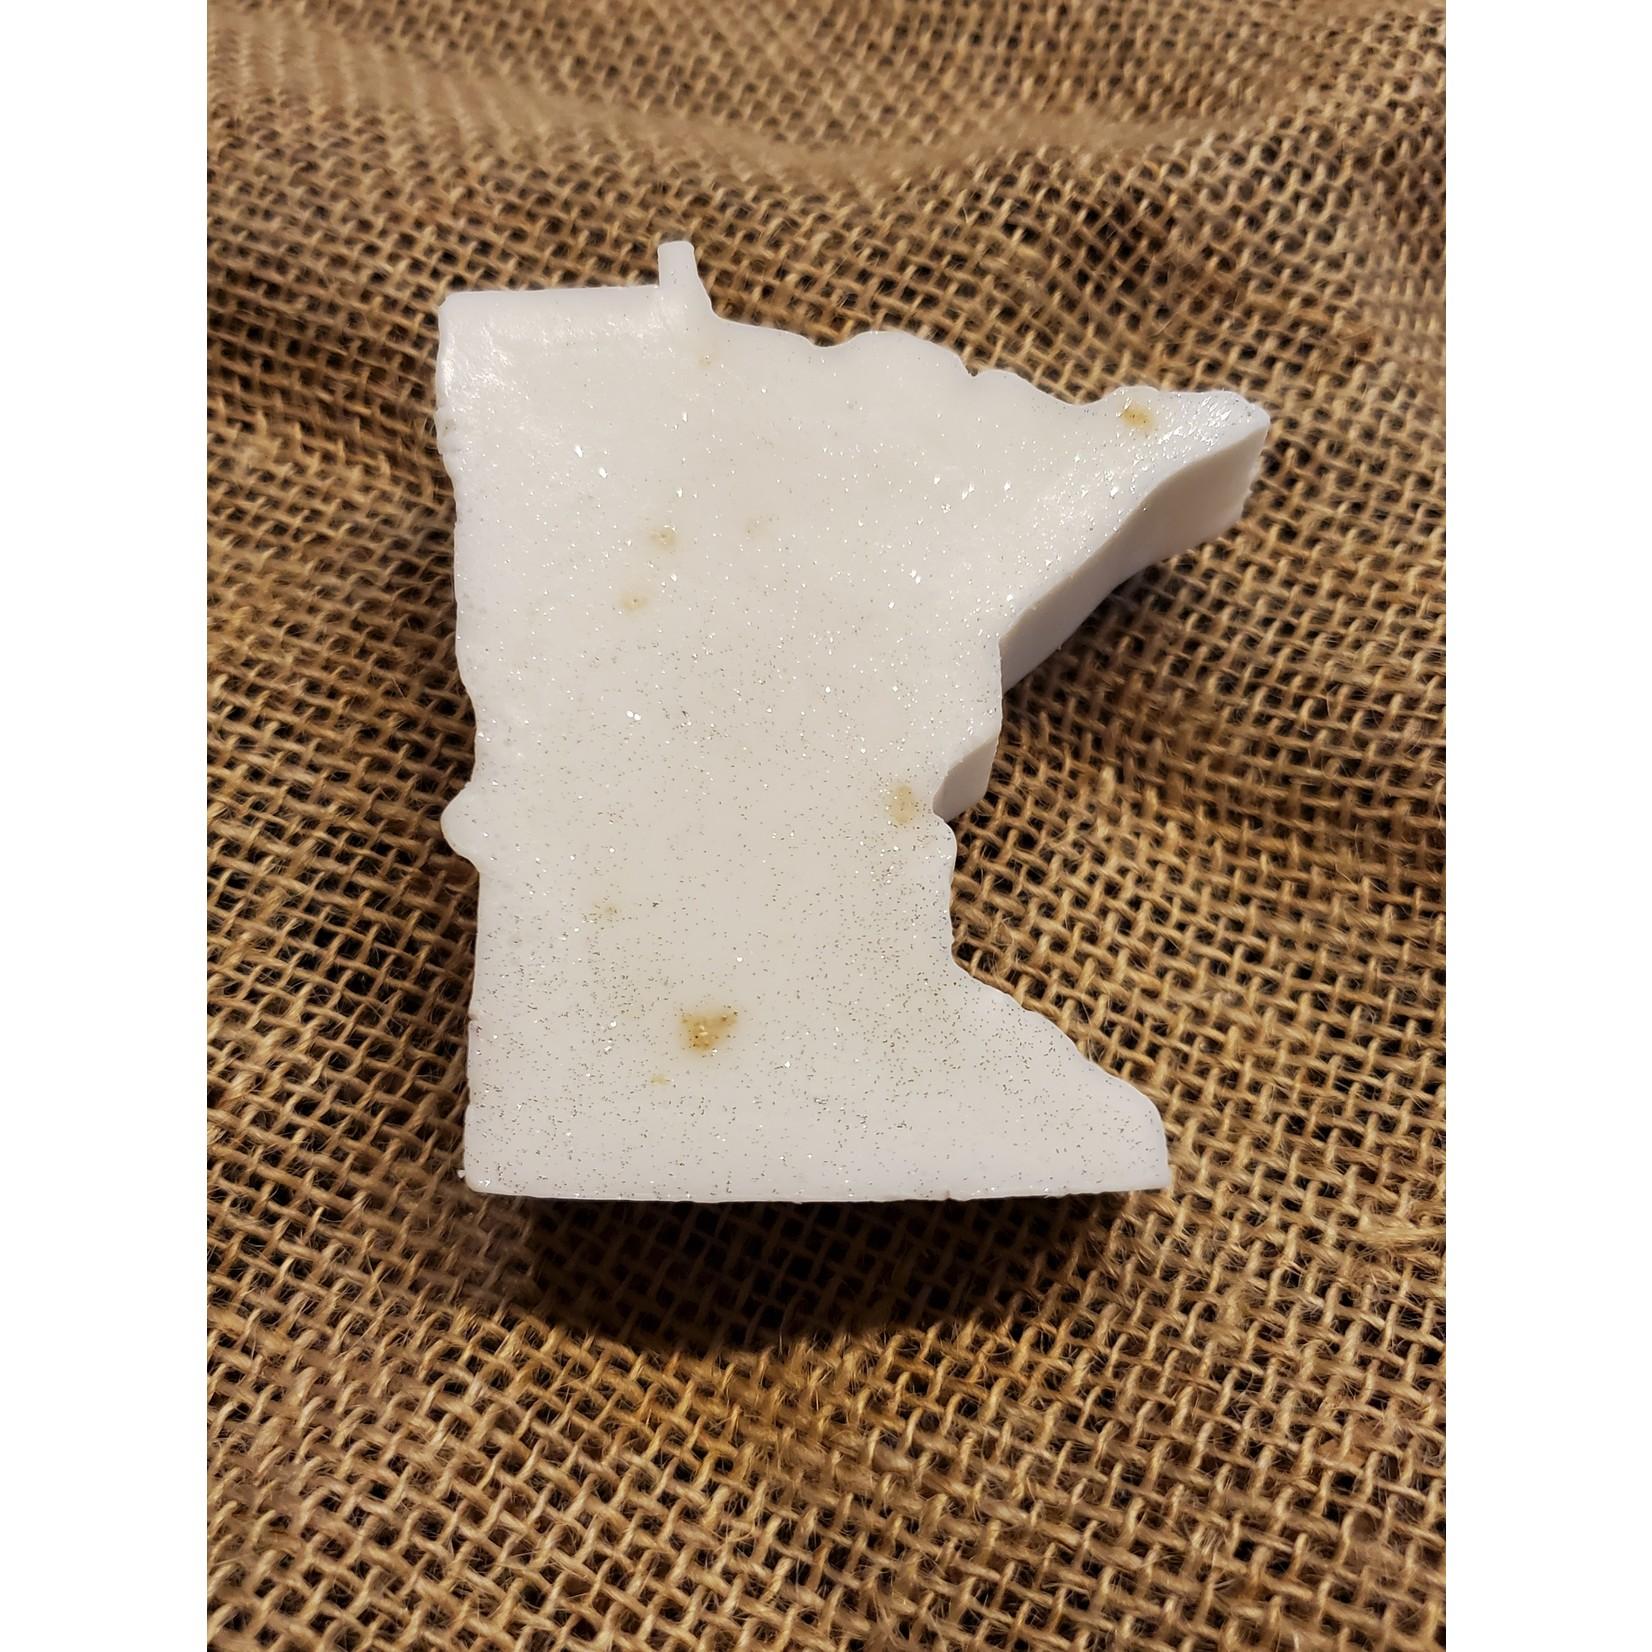 Prairie Girl Soaps & Sundries Minnesota Shape Soaps